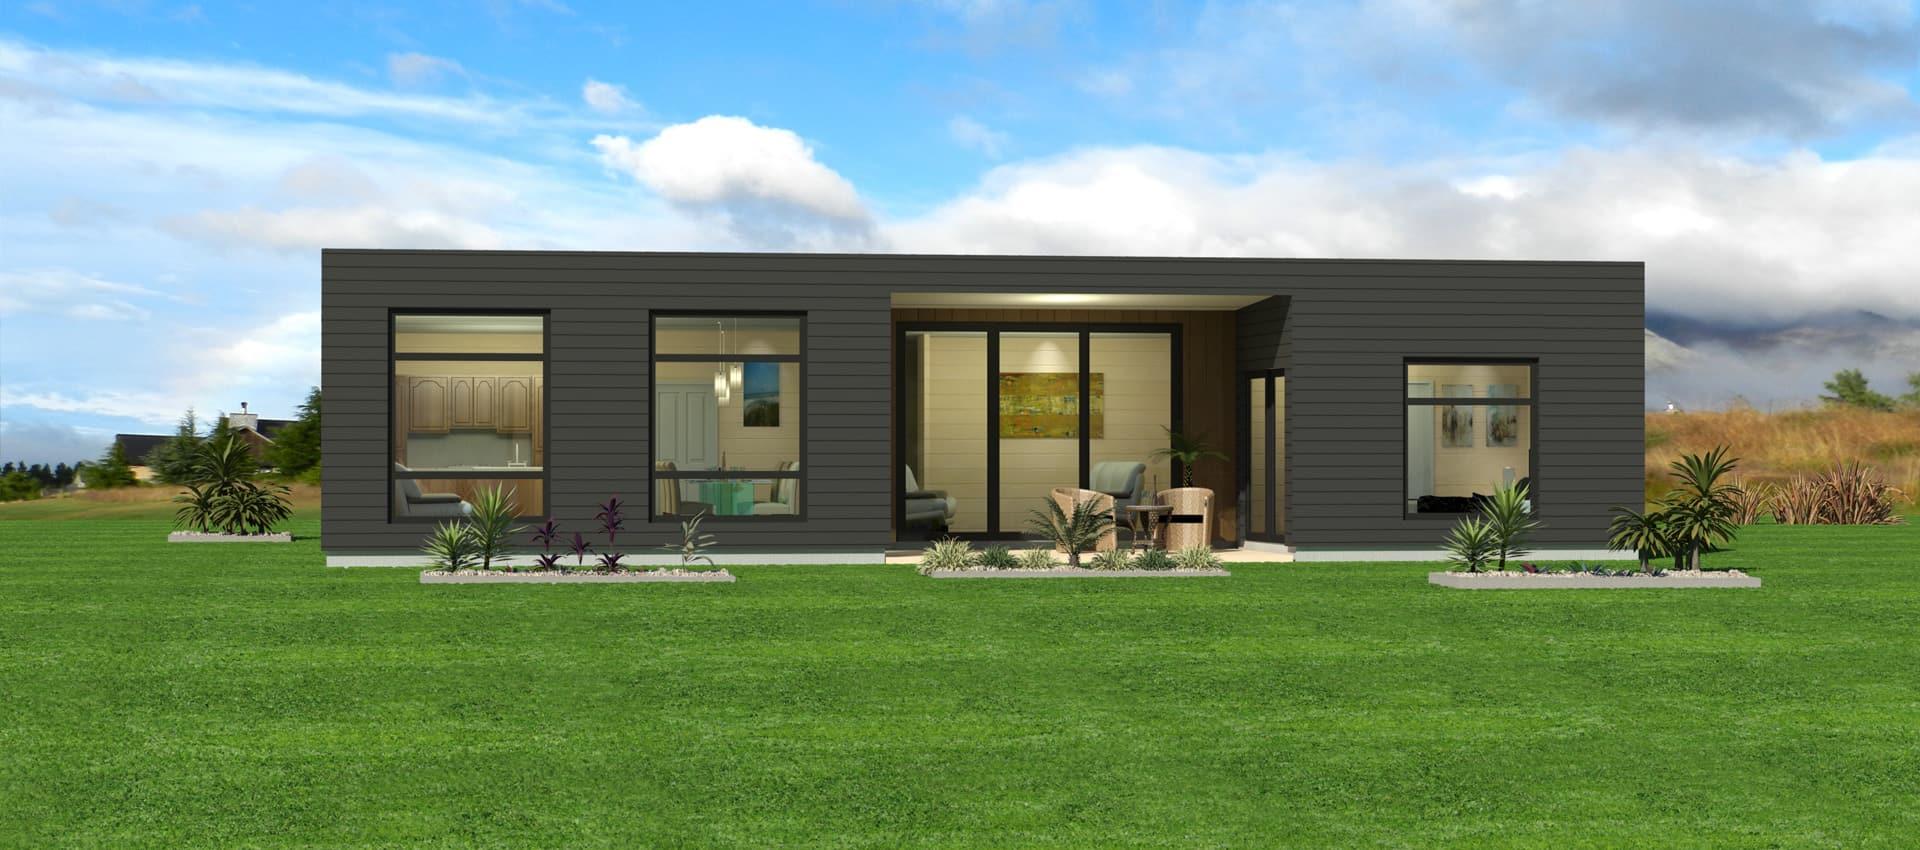 house plans kitset homes nz